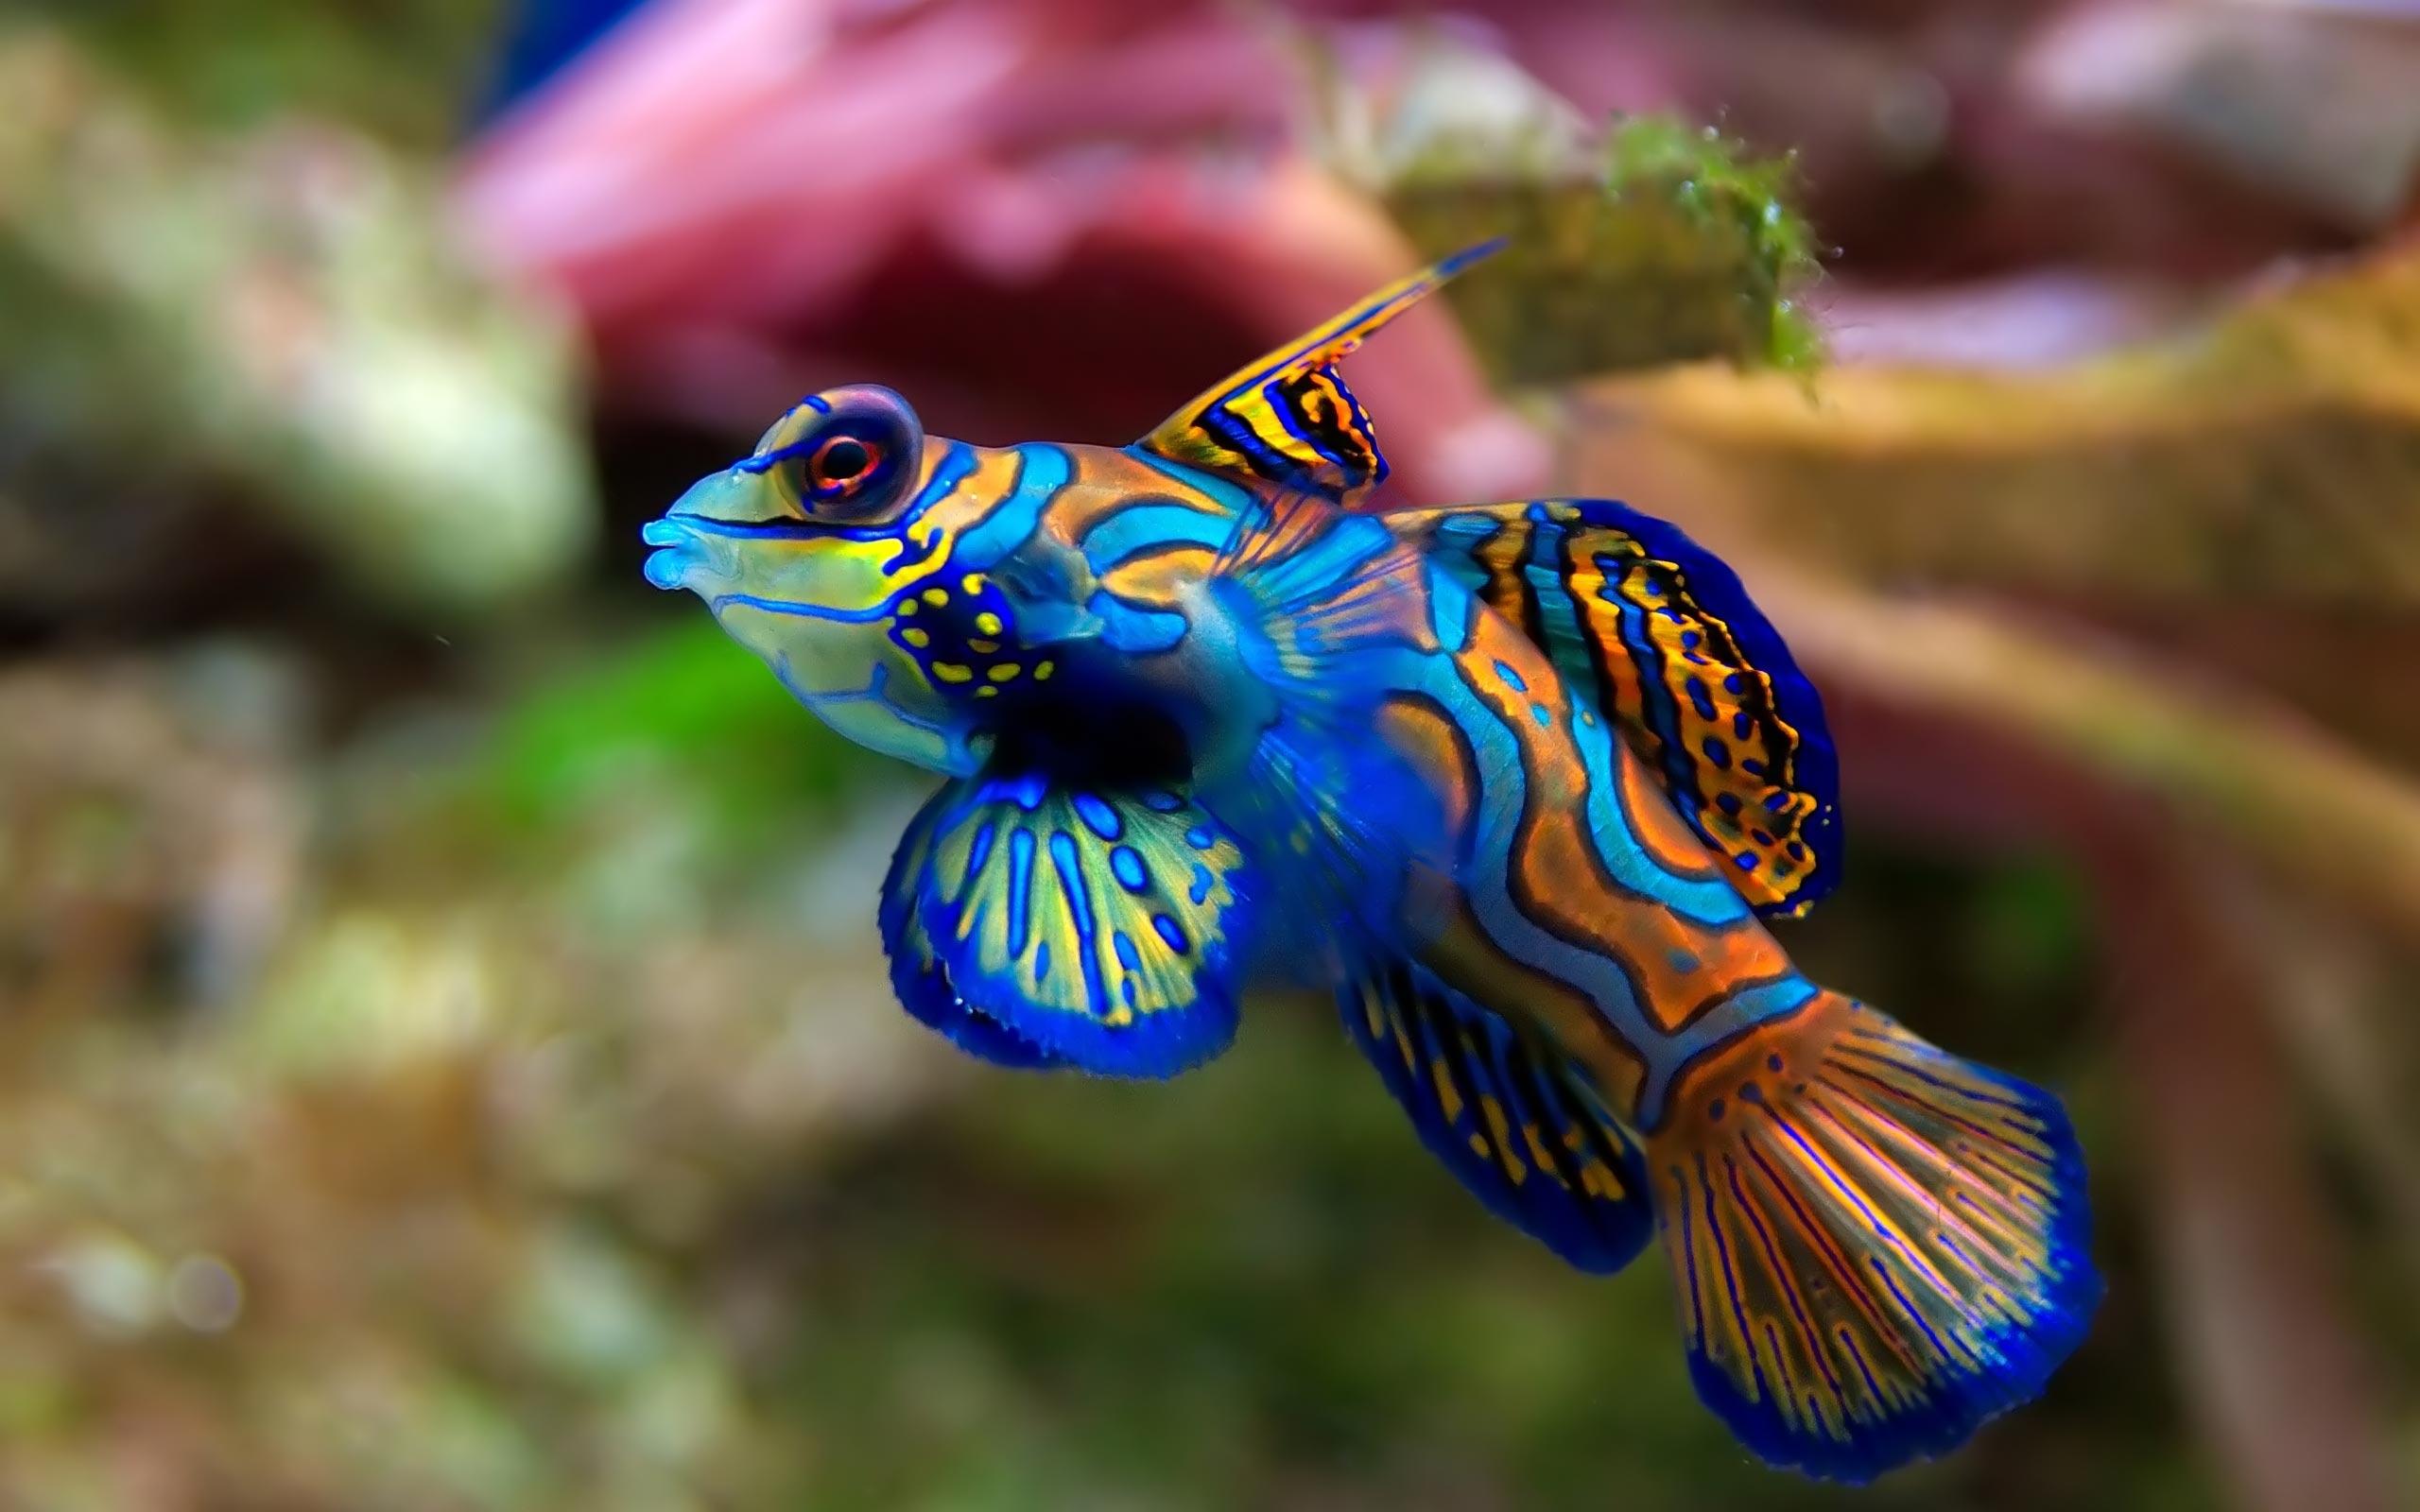 Freshwater aquarium fish cichlids - Fish Saltwater Aquarium Wallpaper High Quality Wallpapers Wallpaper